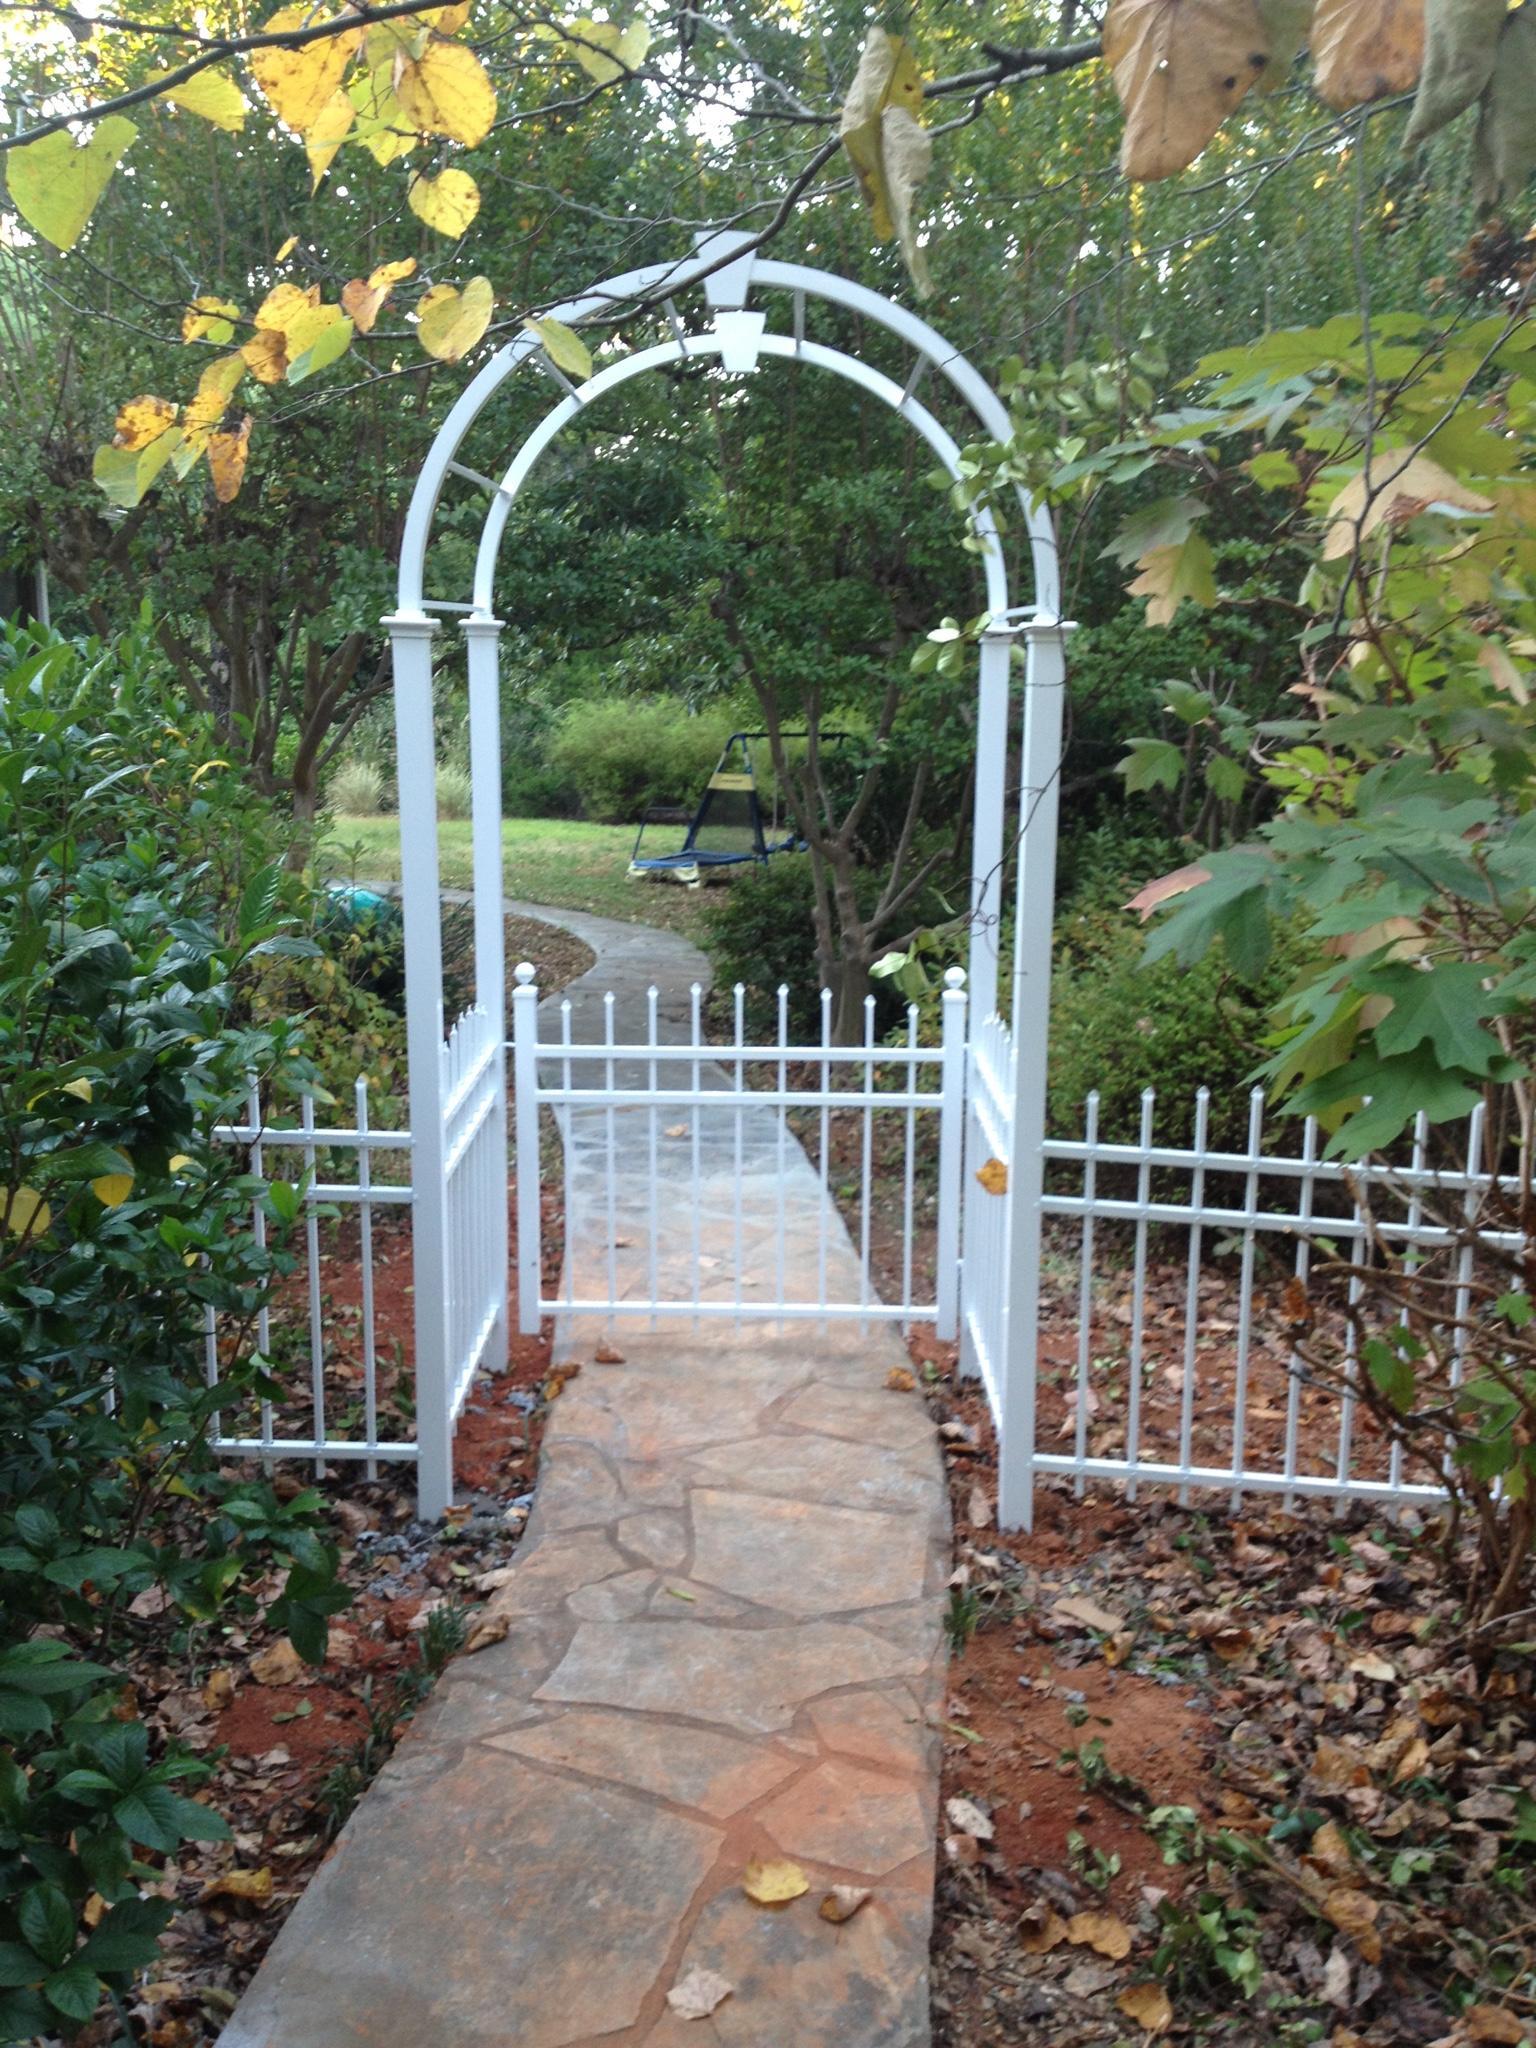 Akridge Fence Co